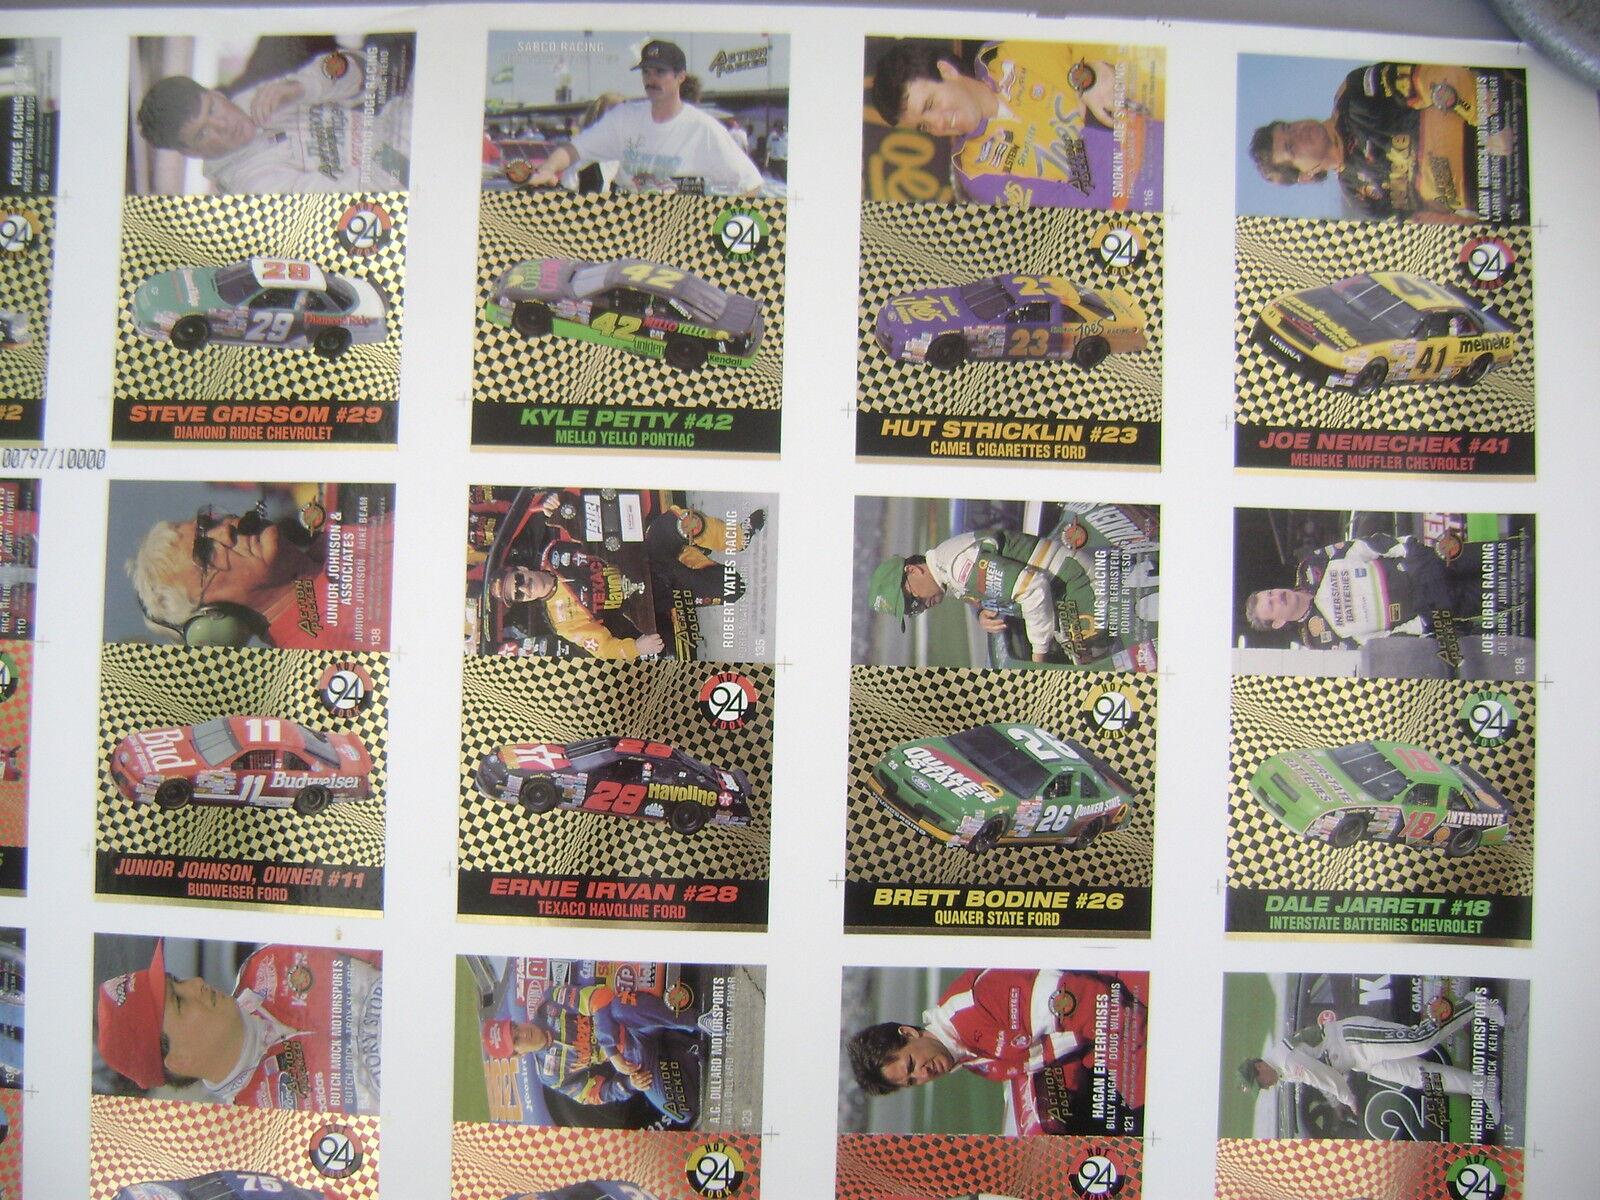 PINNACLE 1994 UNCUT SHEET 28  X X X 39  OF 42 CARDS  BONNETT LABONTES K.PETTY ETC b23b28